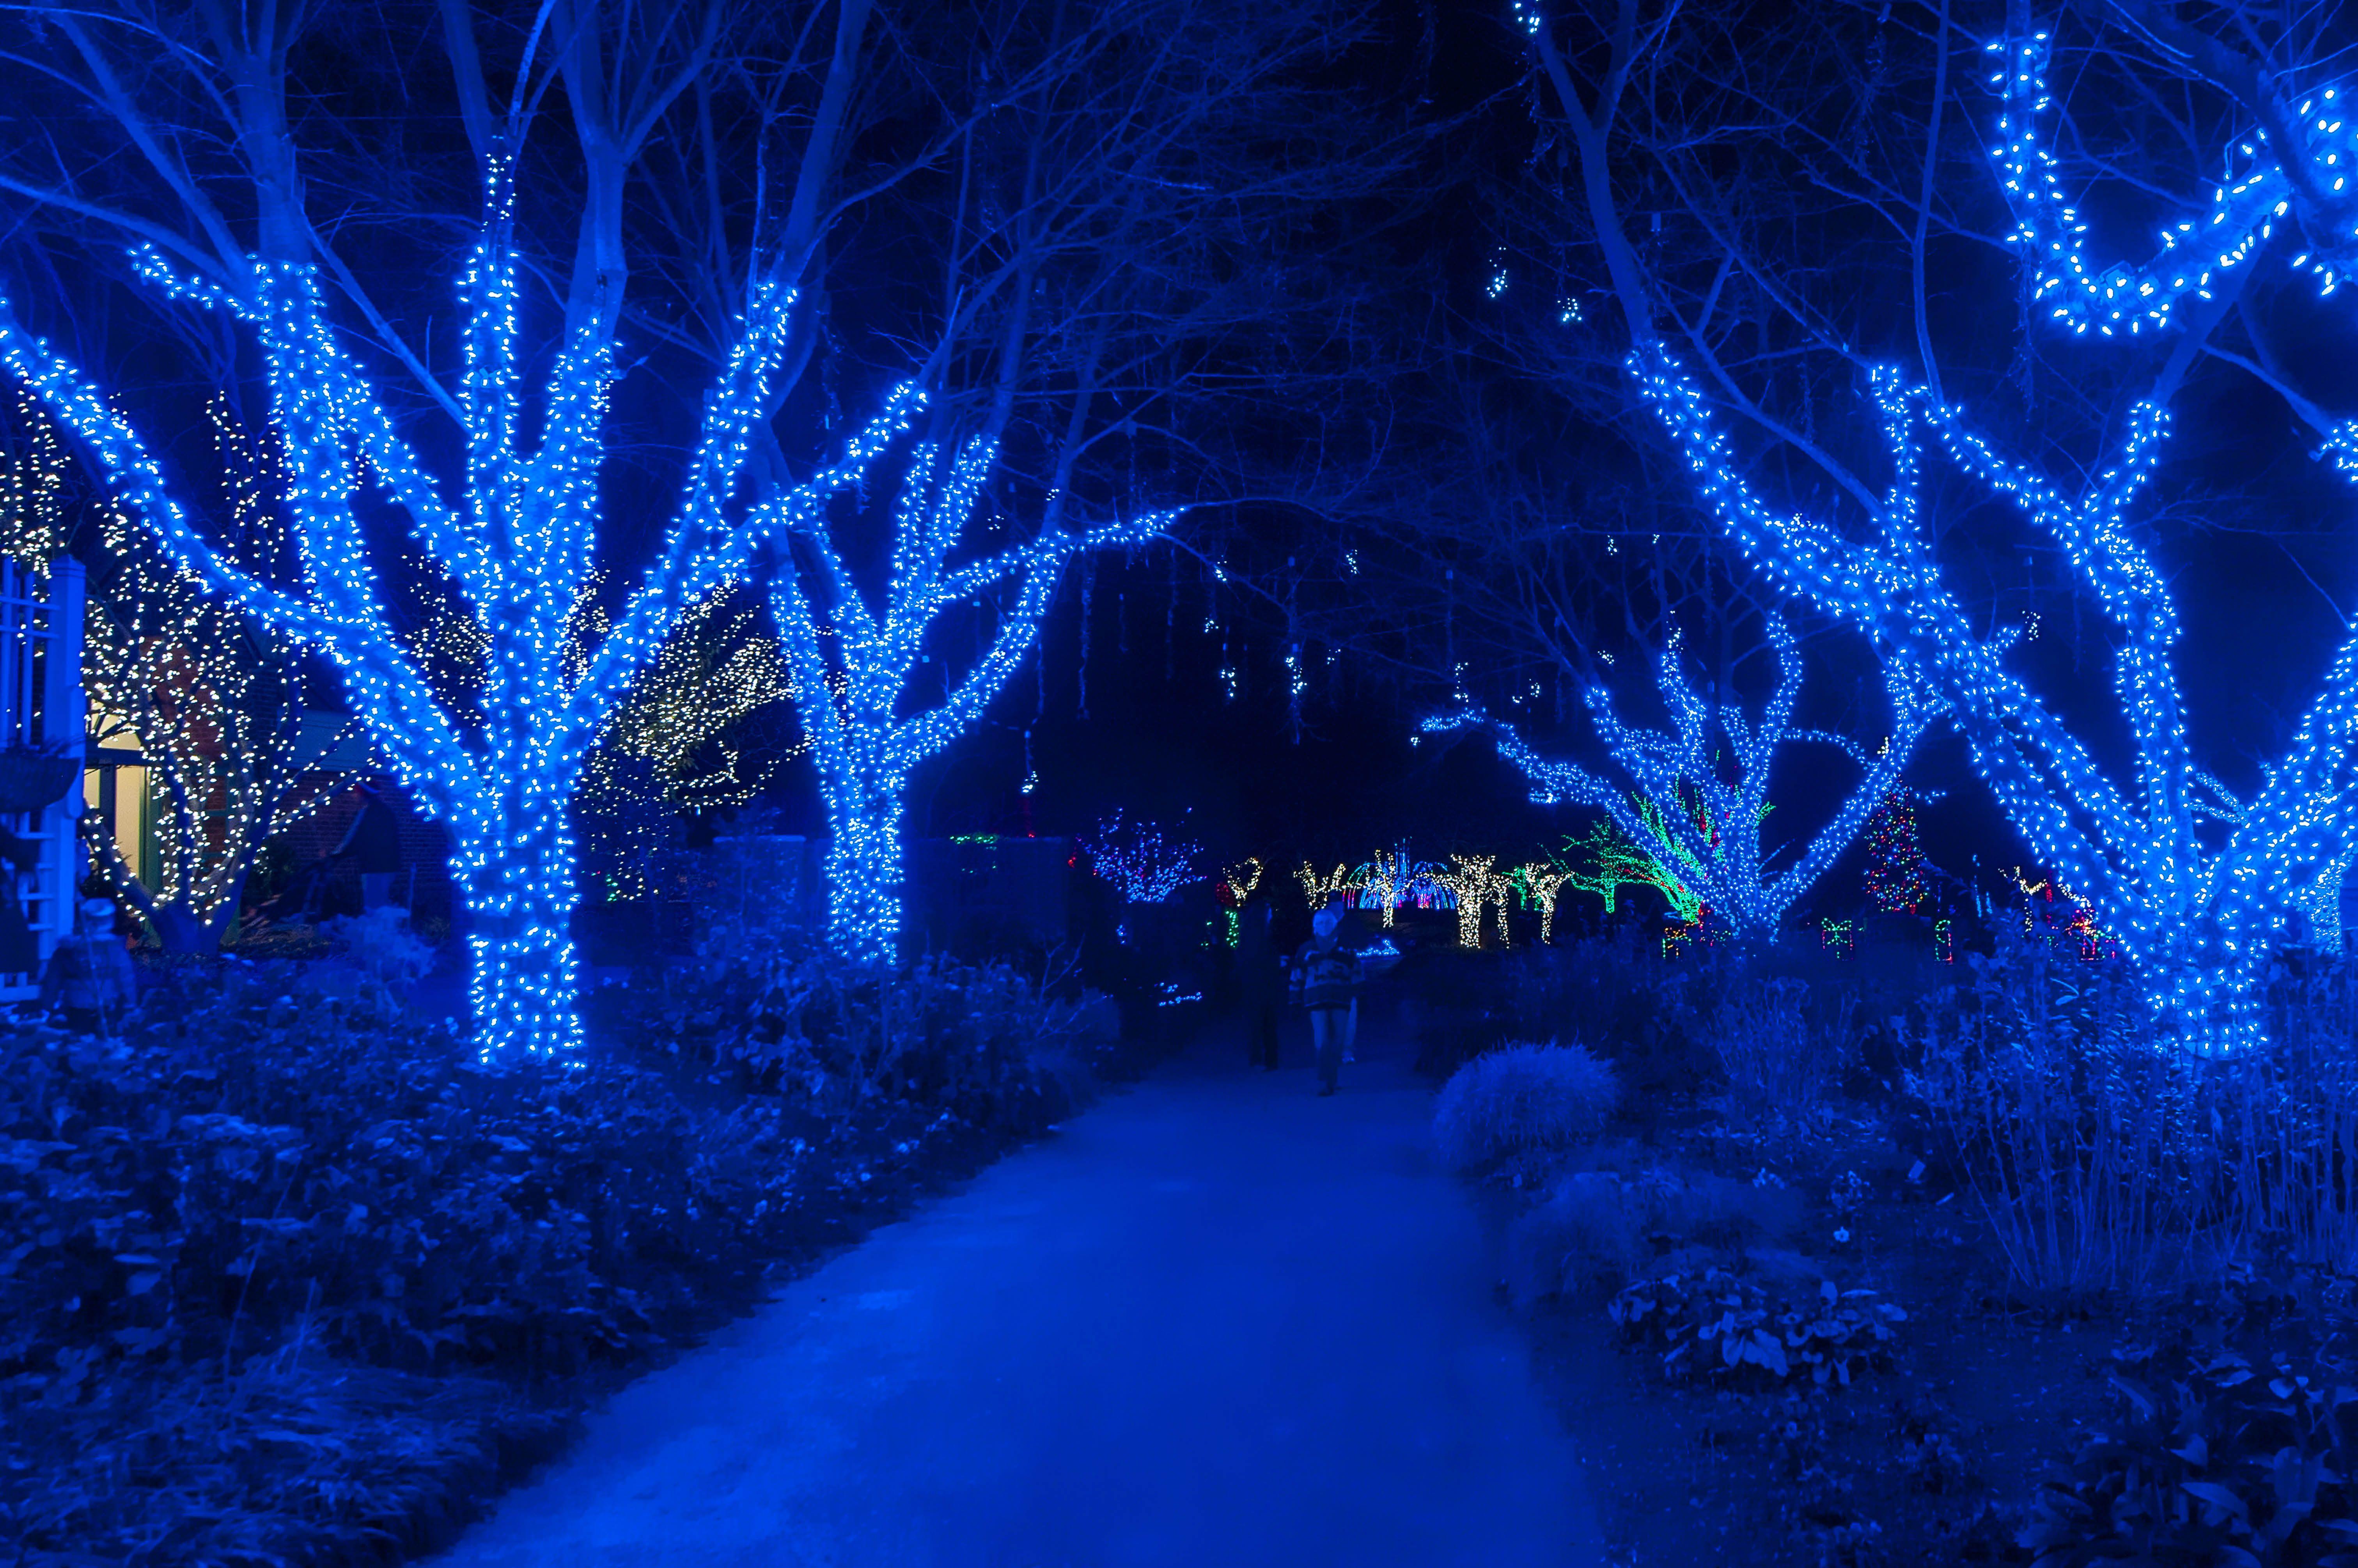 072416ba62cfed4658dc0727a5e8982b - Meadowlark's Winter Walk Of Lights Meadowlark Botanical Gardens December 28